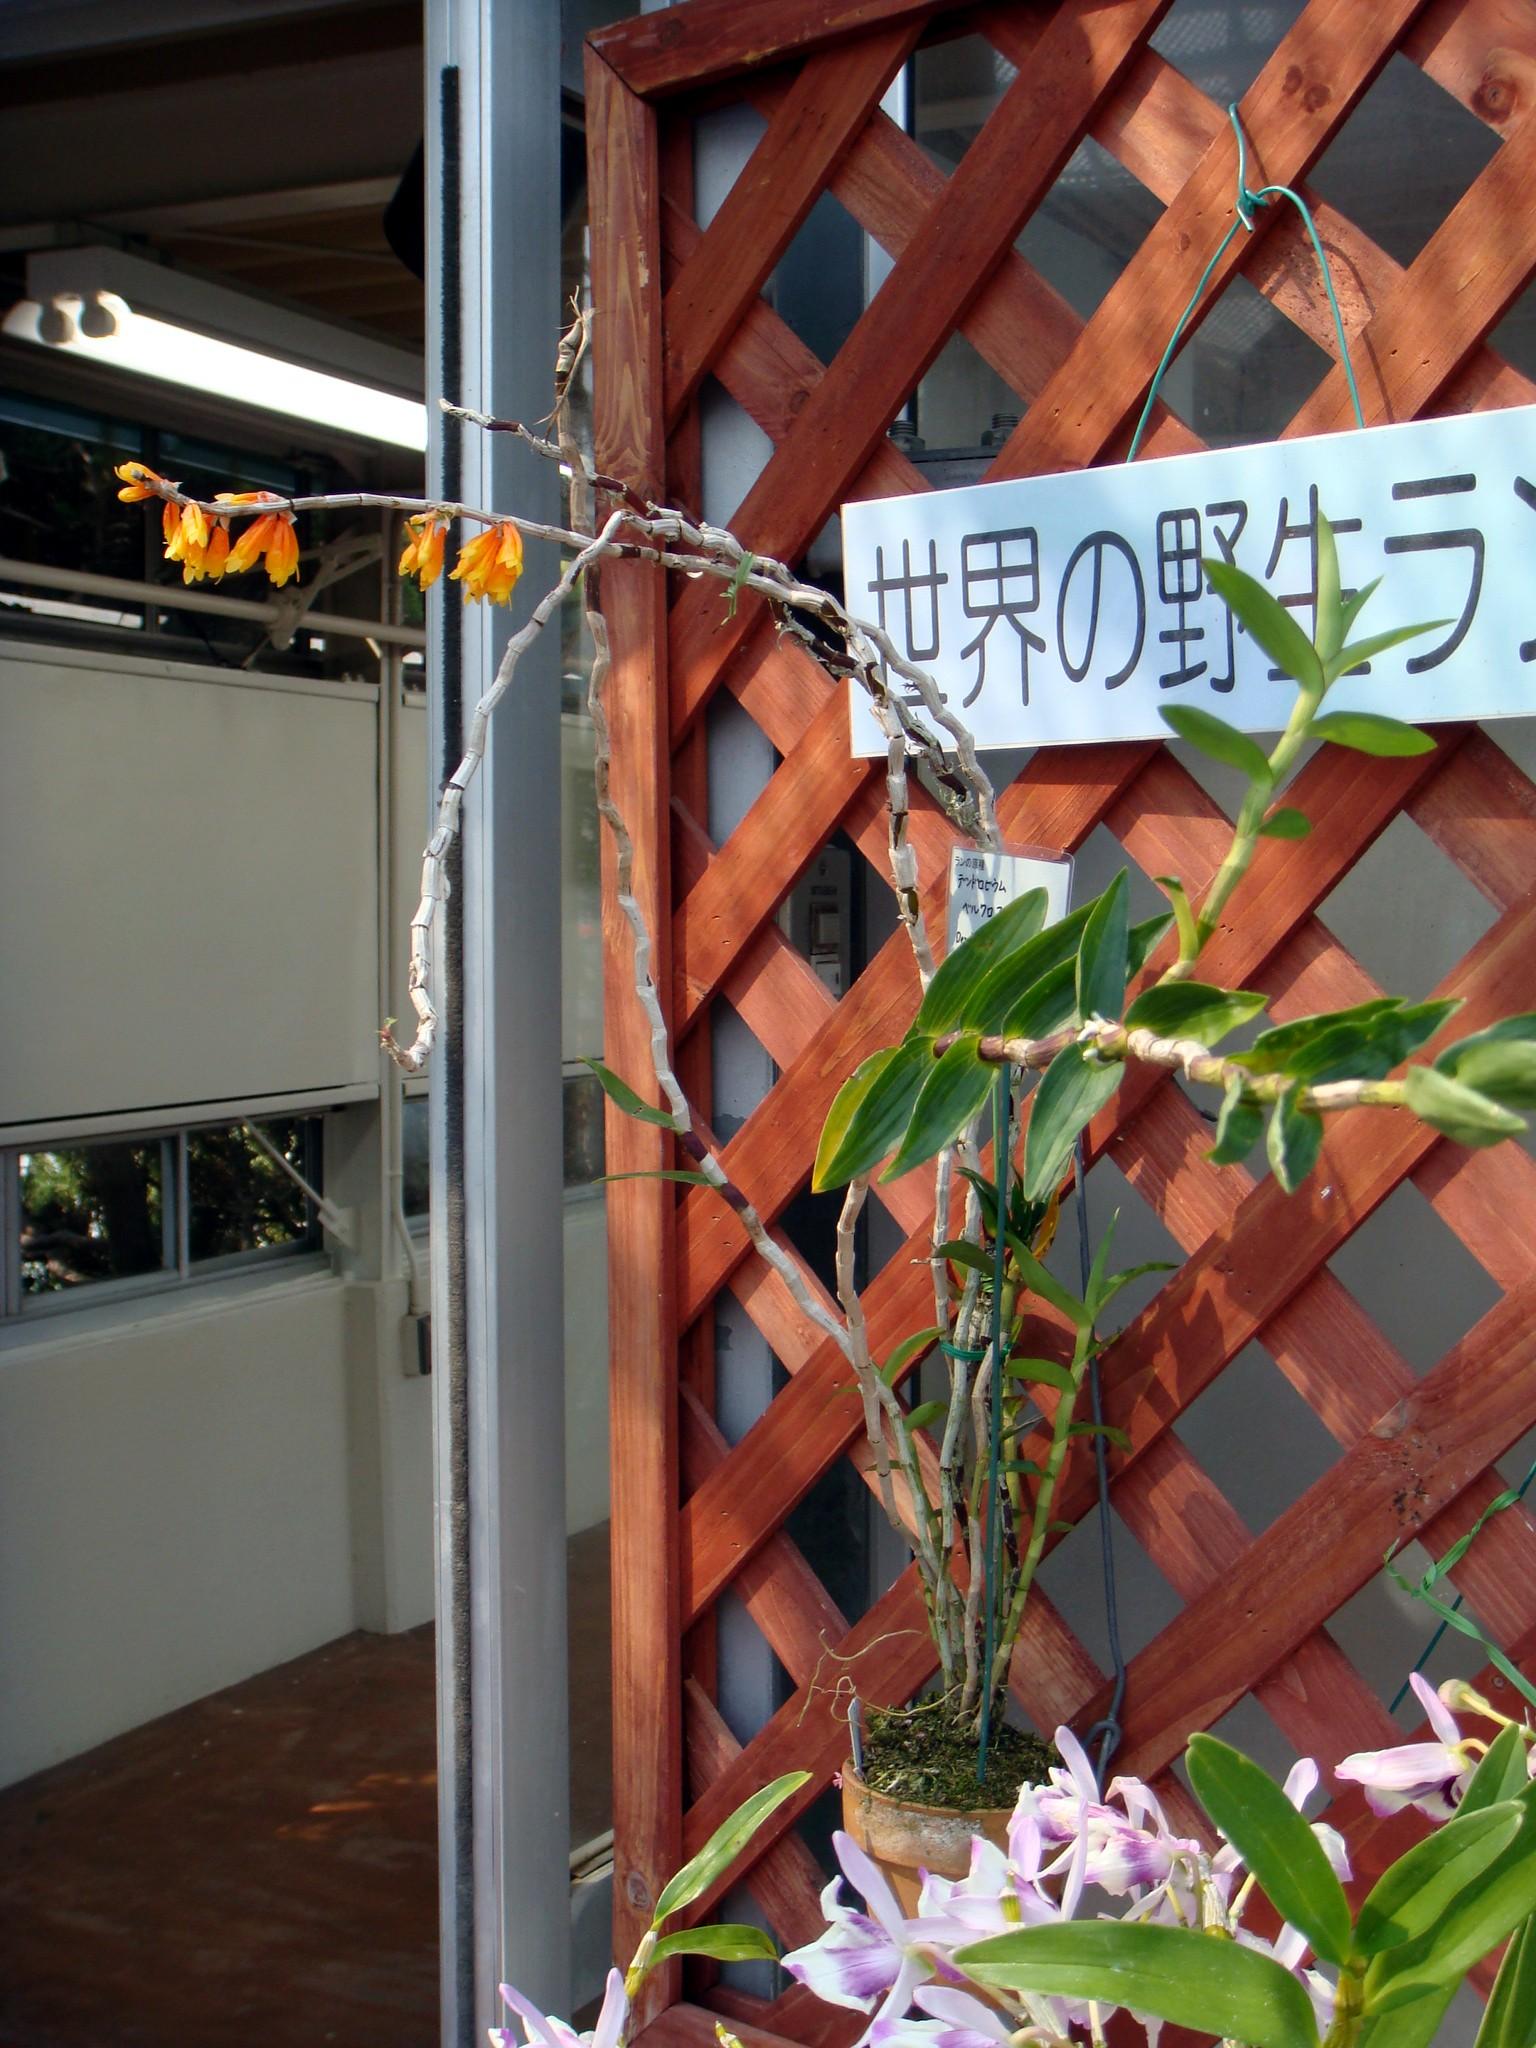 http://orchids.la.coocan.jp/Dendrobium/Dendrobium%20verruculosum/DSC04247.JPG